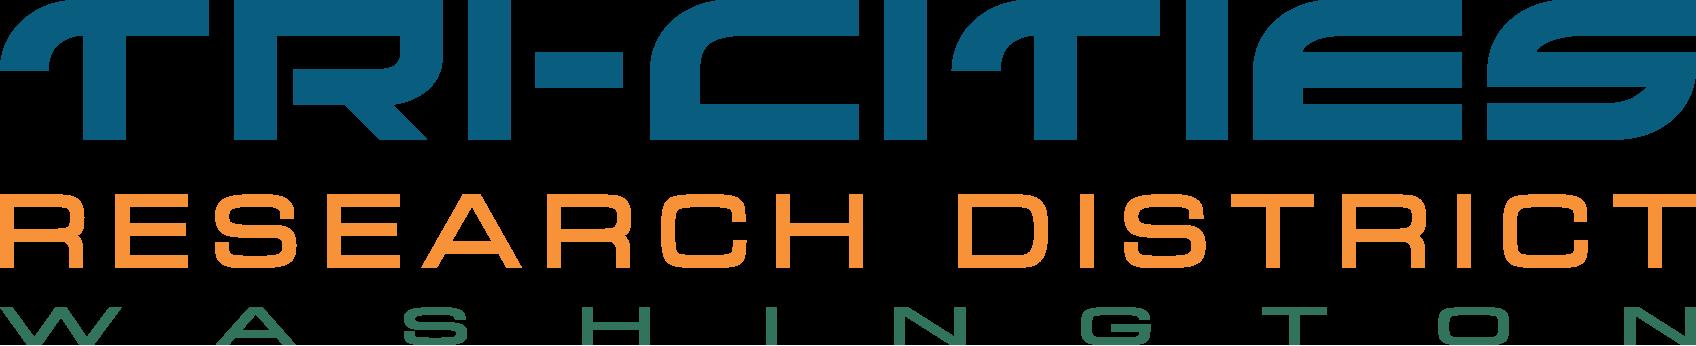 tcrd-logo-text